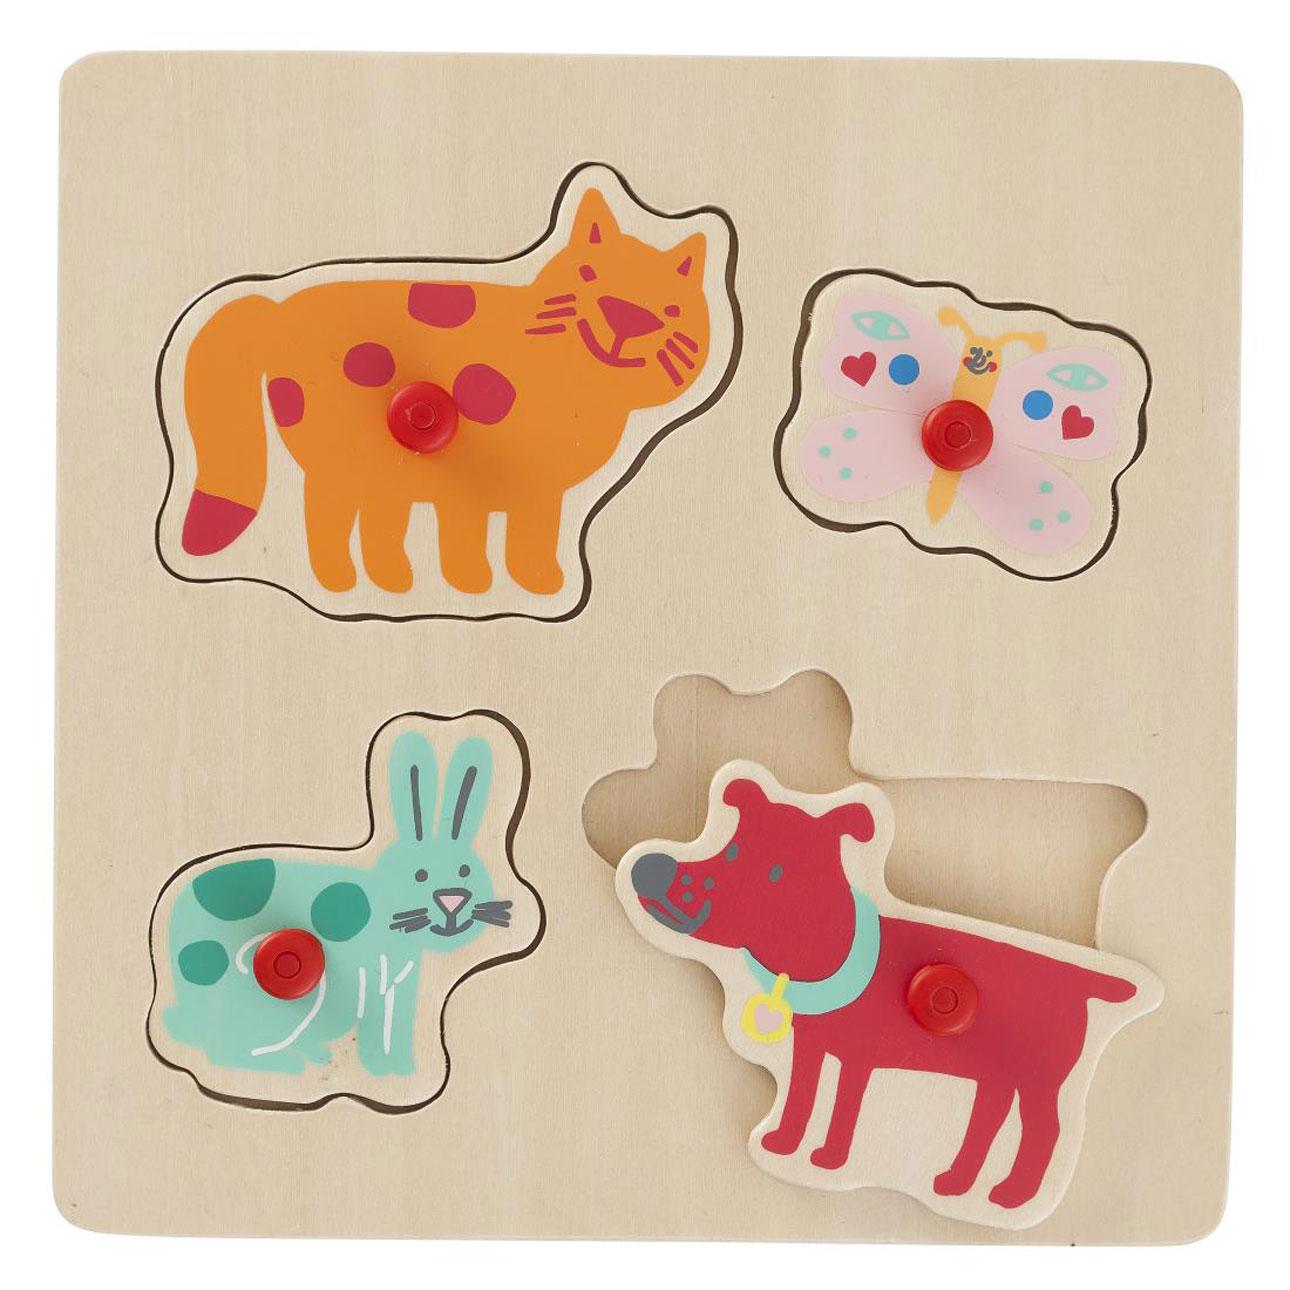 hema houten speelgoed puzzel puzzel dieren